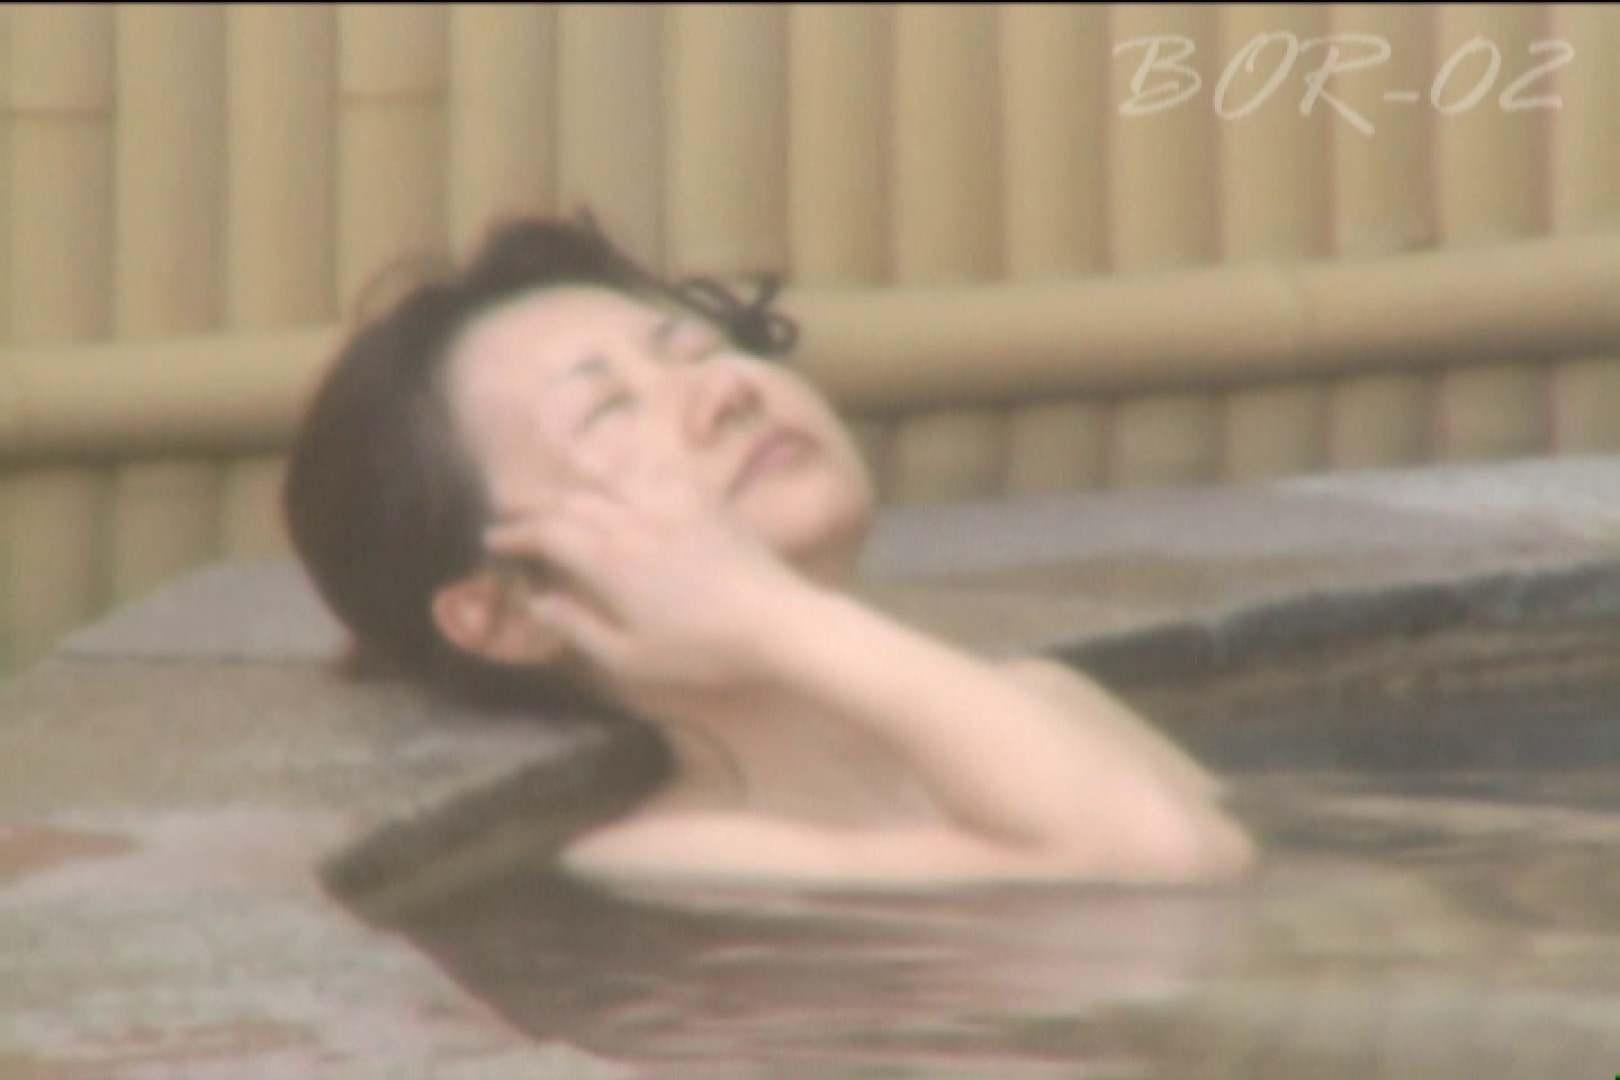 Aquaな露天風呂Vol.477 OLセックス 盗撮われめAV動画紹介 86画像 47